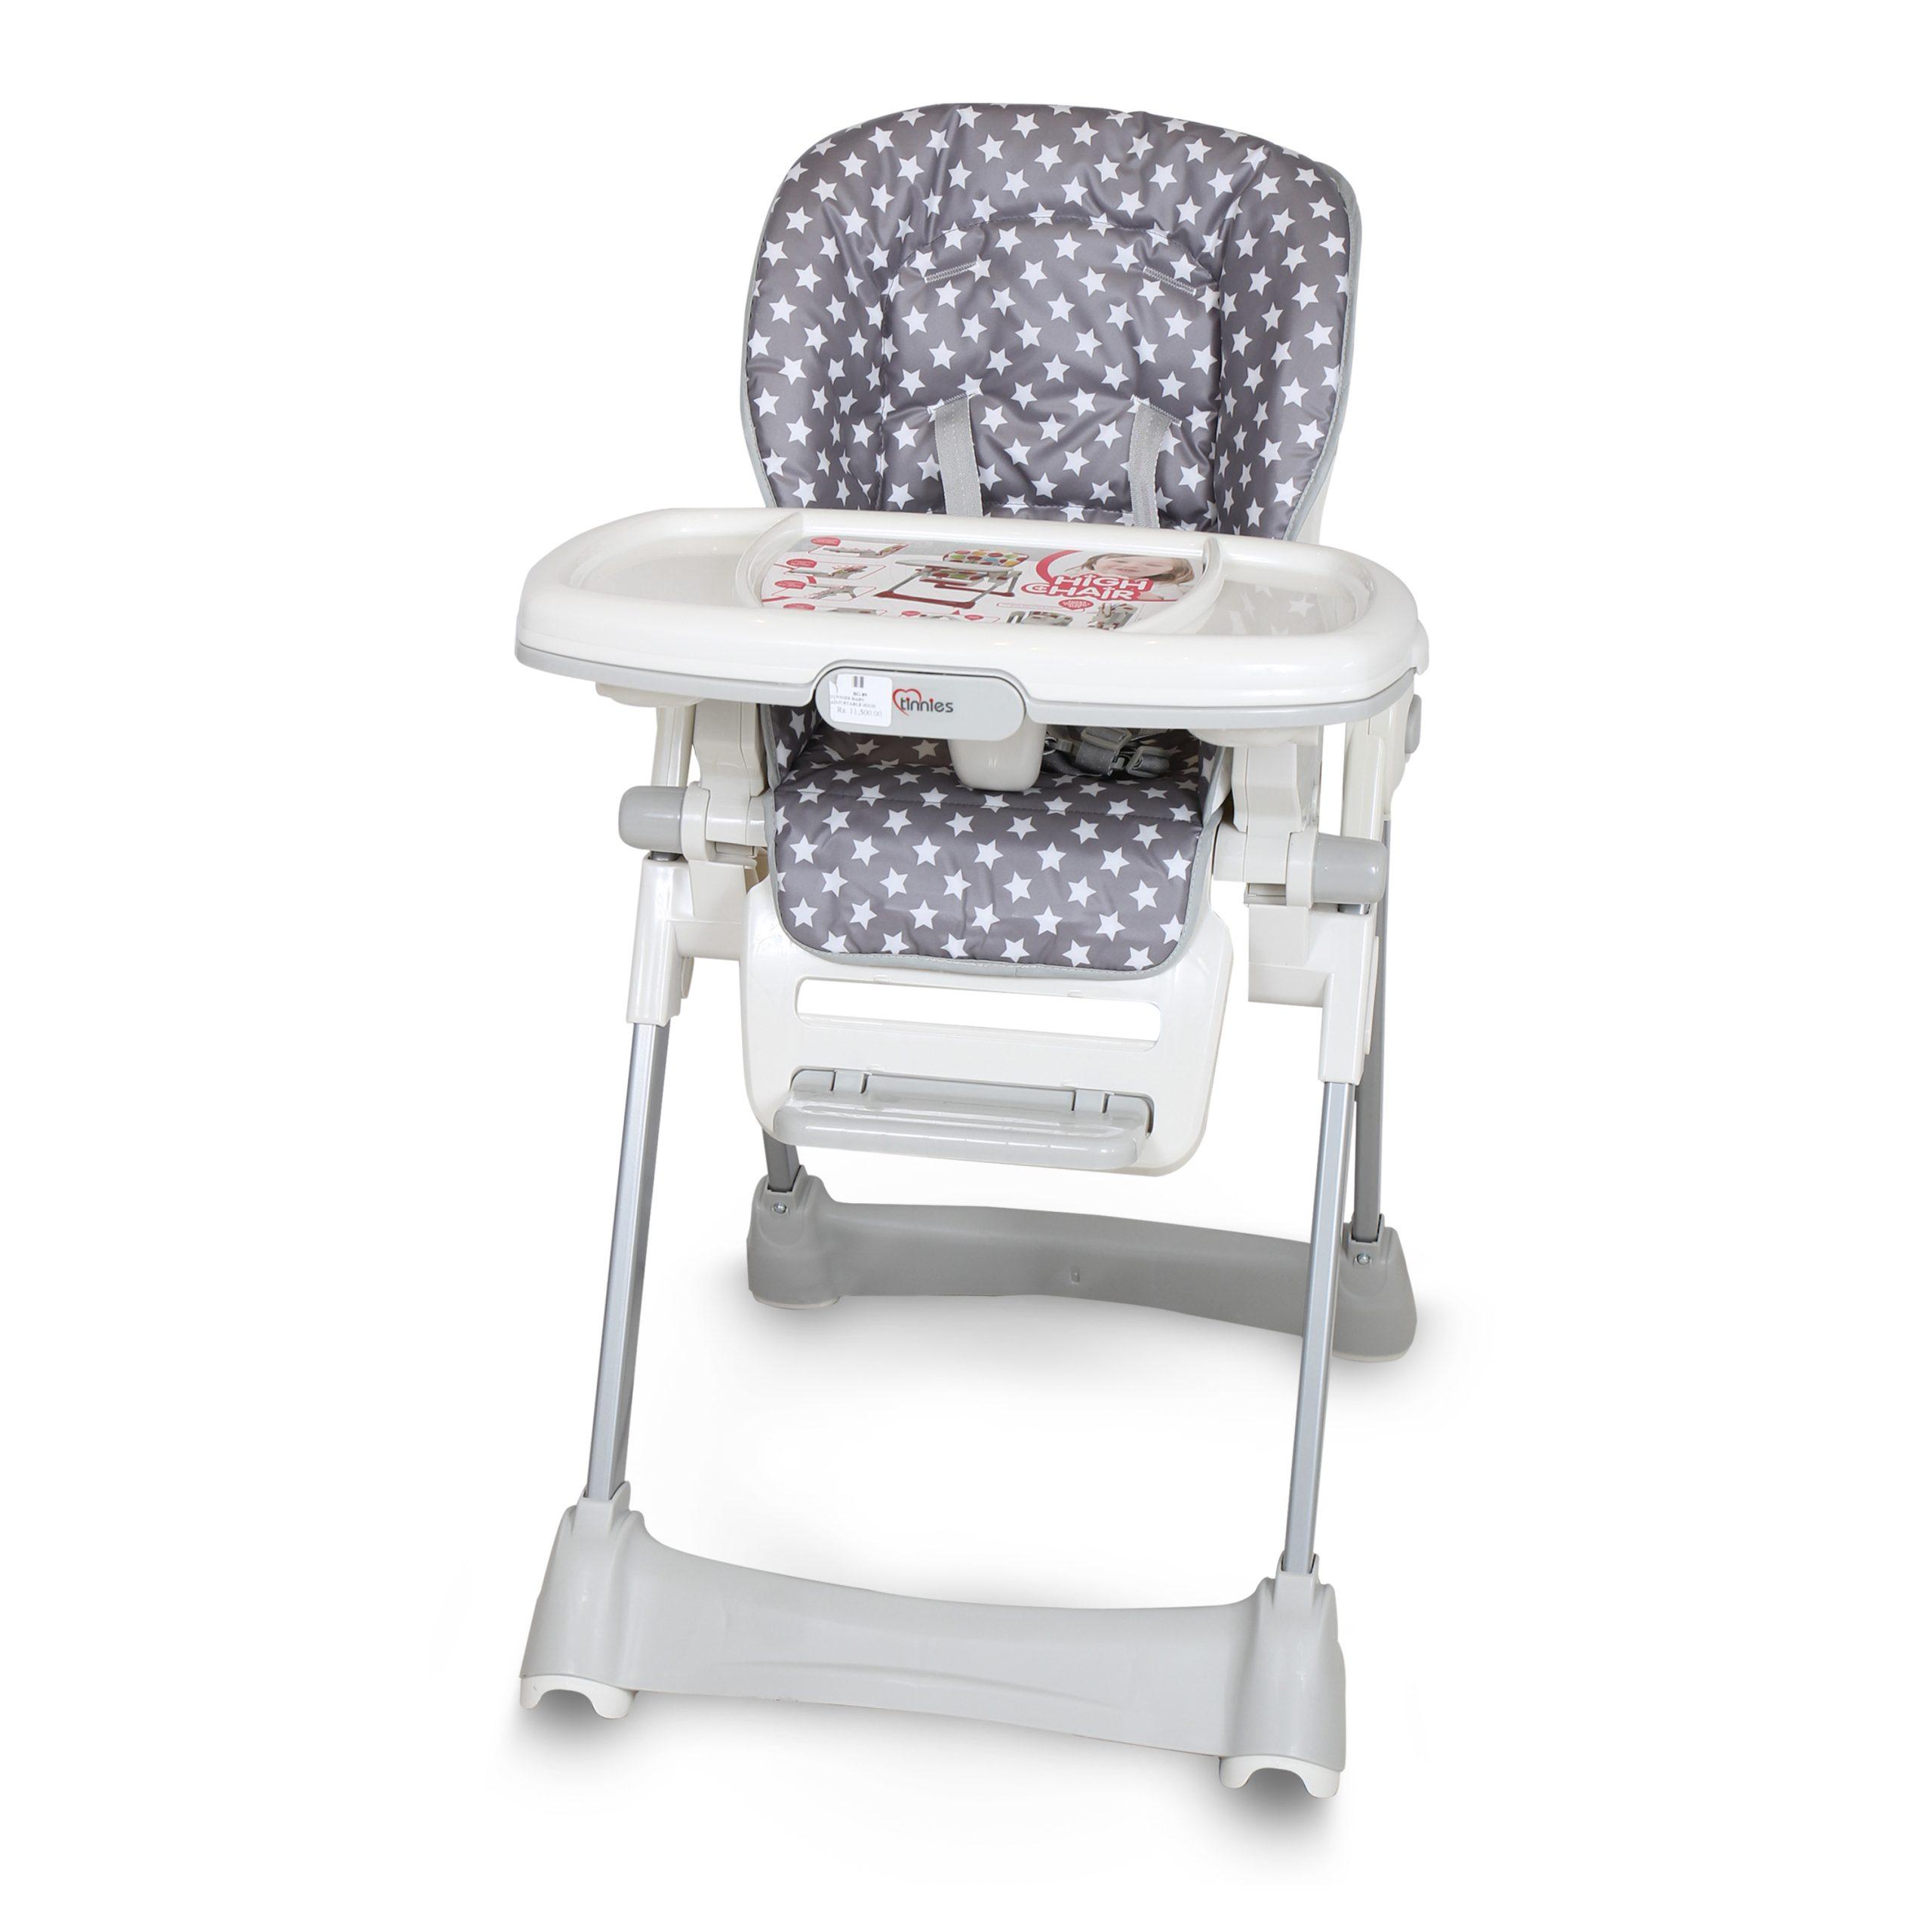 Tinnies Baby Adjustable High Chair (Grey) - (BG-89)